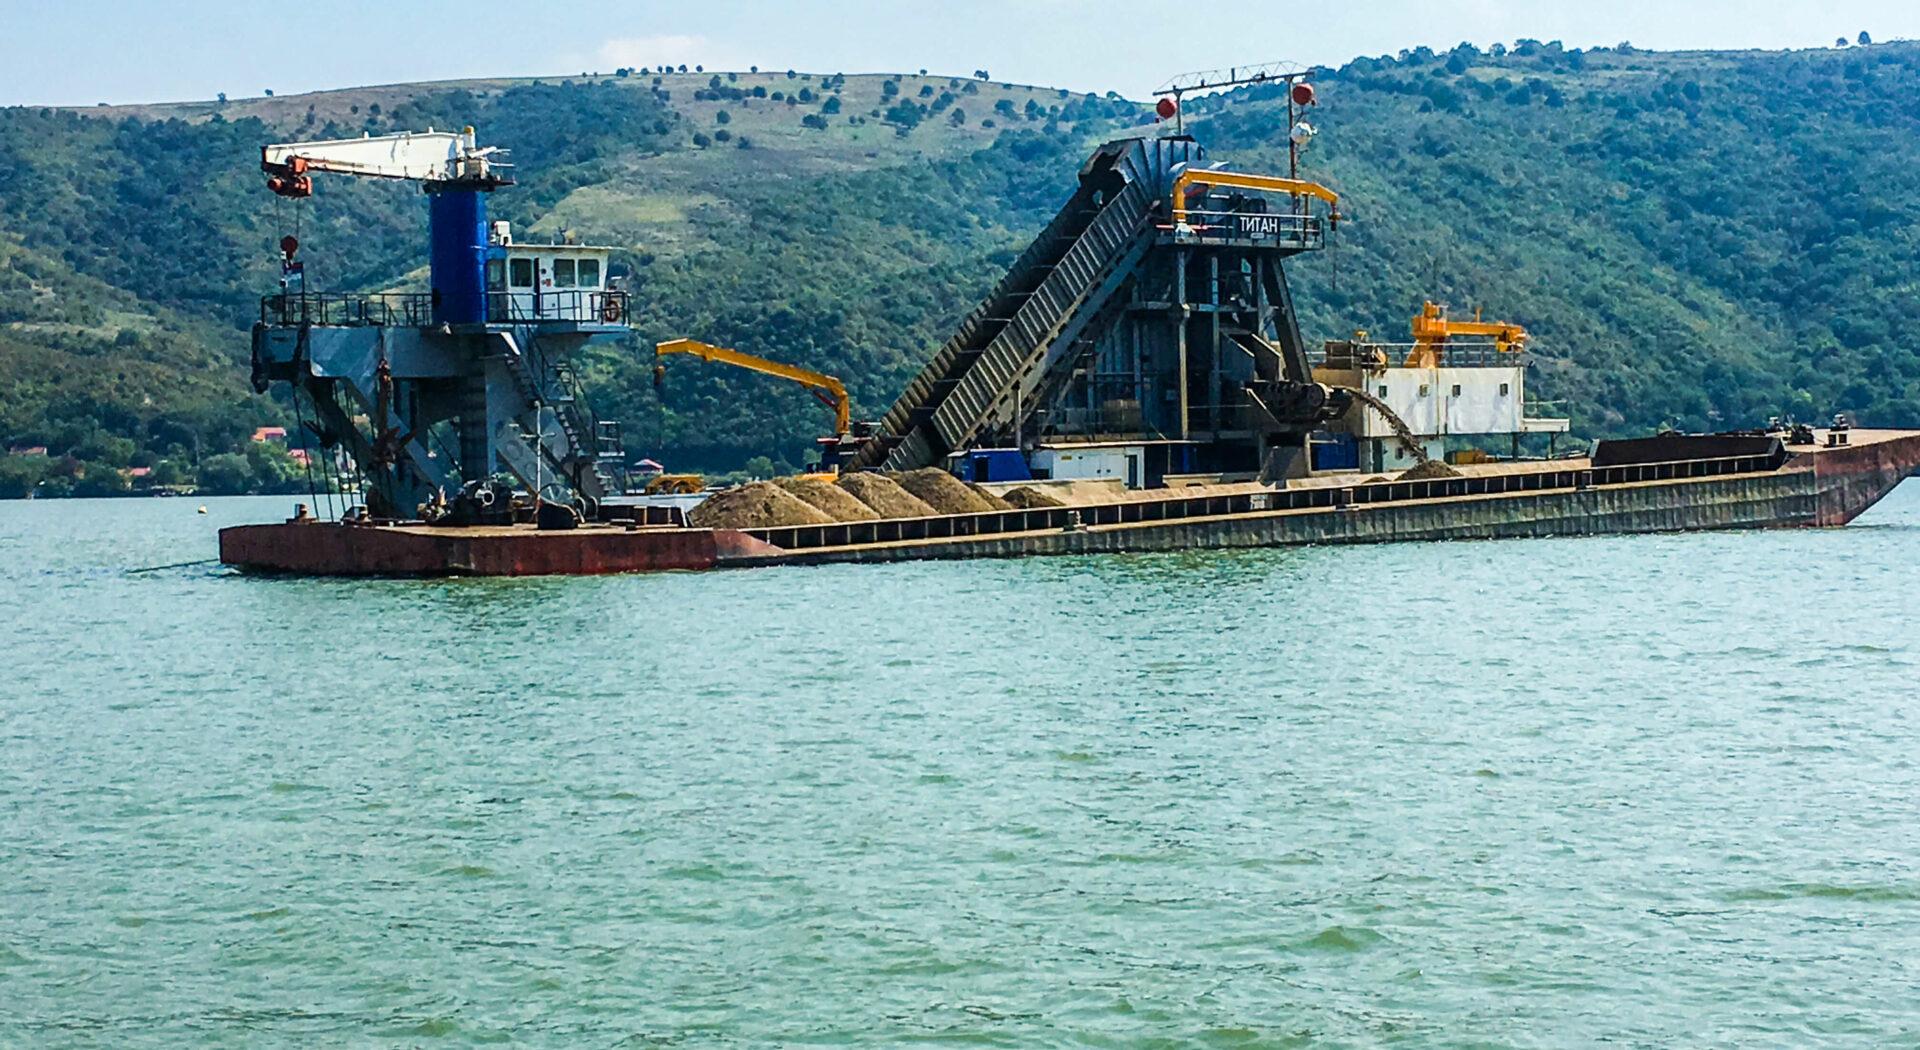 Mudringslekter på Donau_red